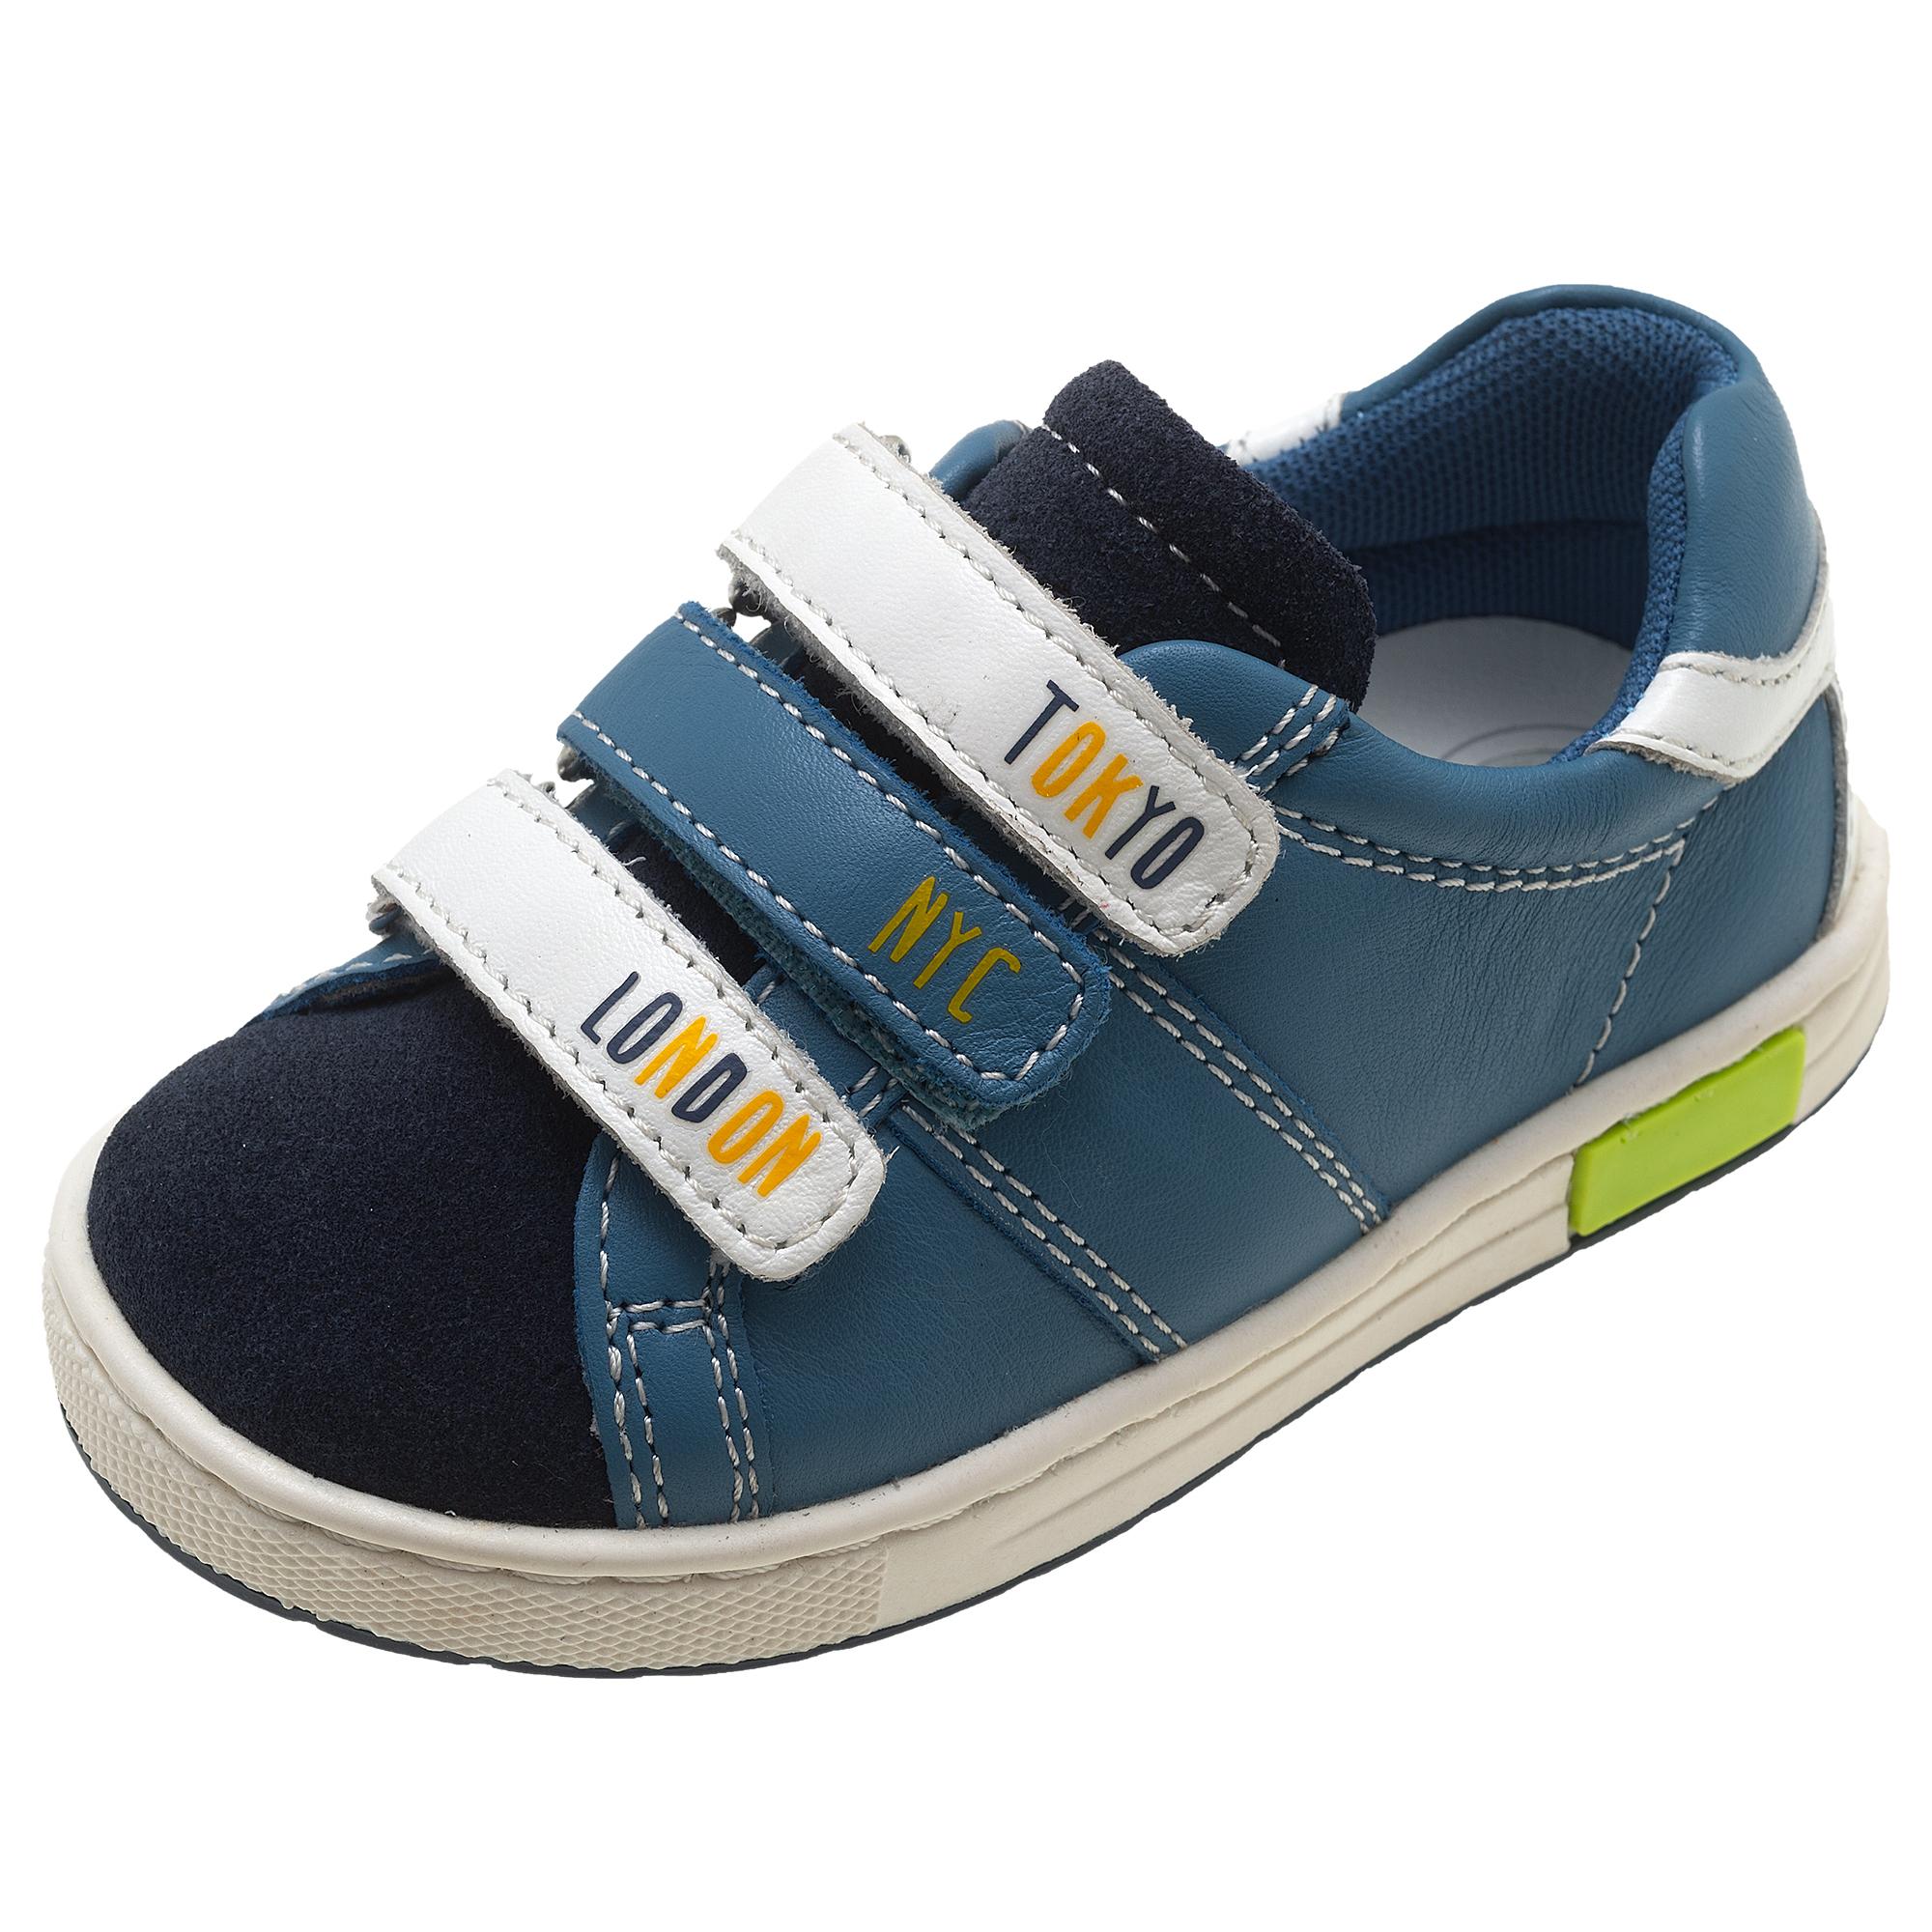 Pantofi sport copii Chicco Crono, bleumarin cu model, 61599 din categoria Pantofi sport copii